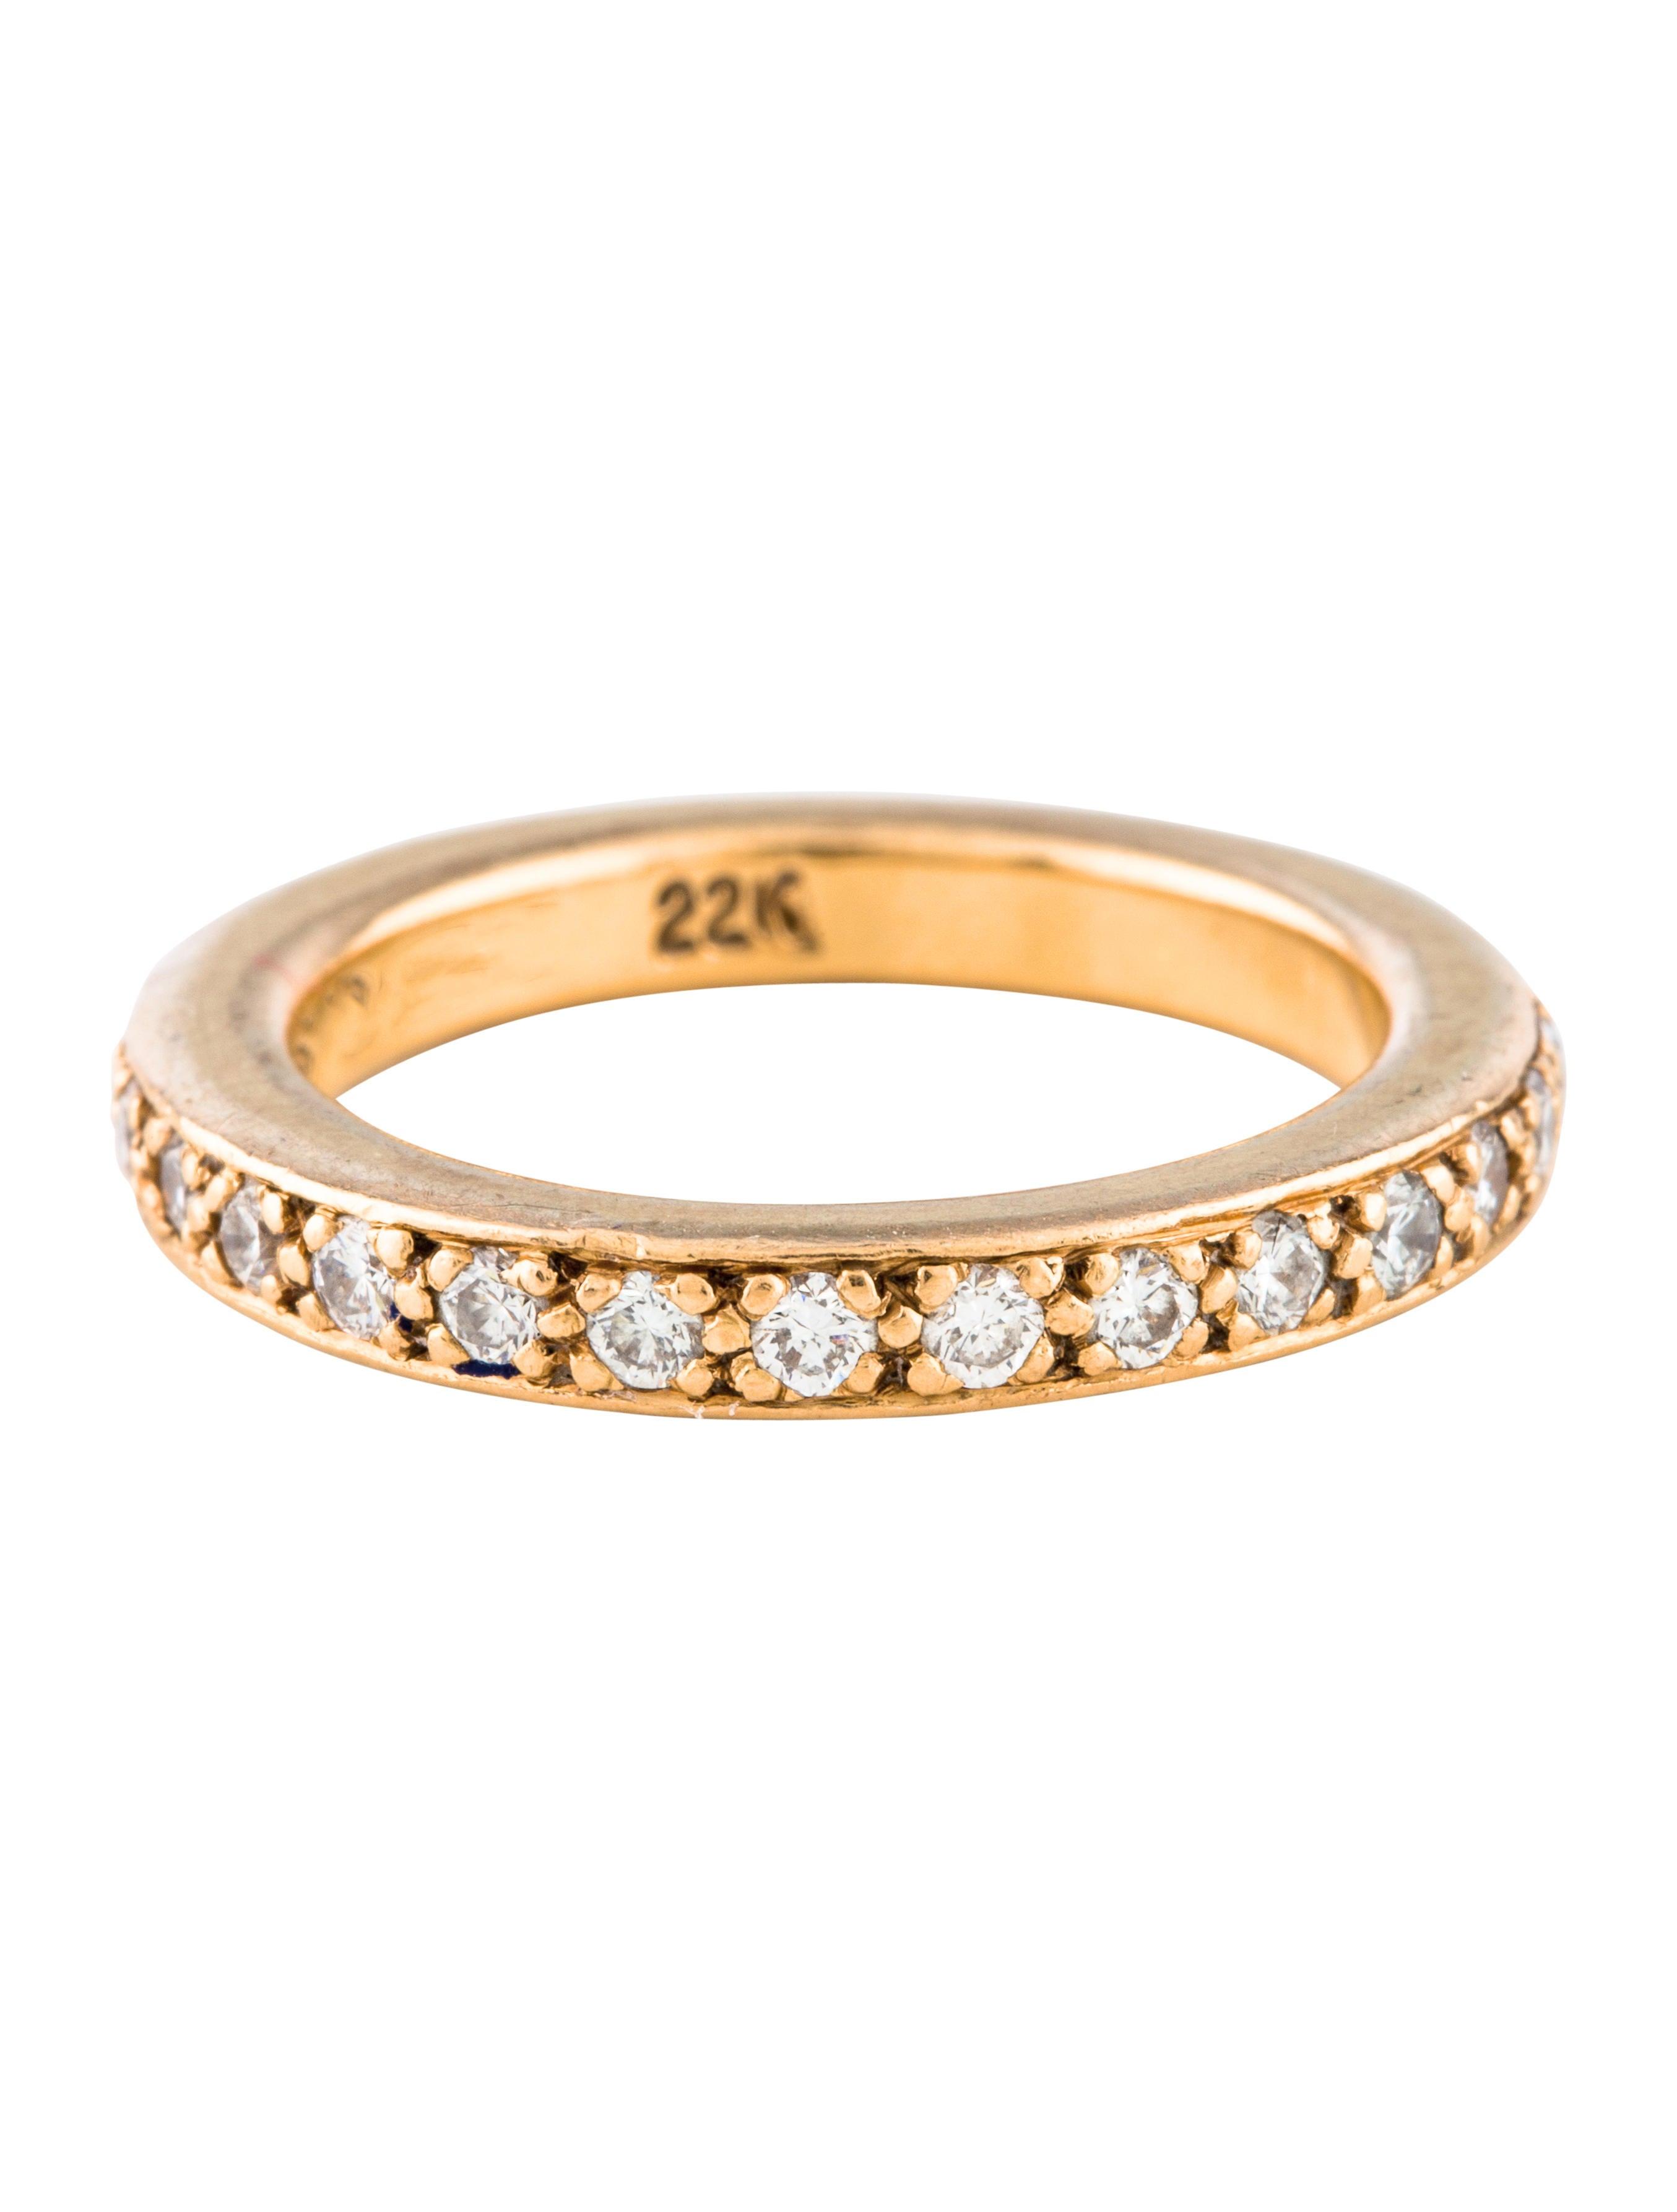 6454af06a952 Chrome Hearts 22K Diamond TFL Eternity Ring - Rings - CHH23107